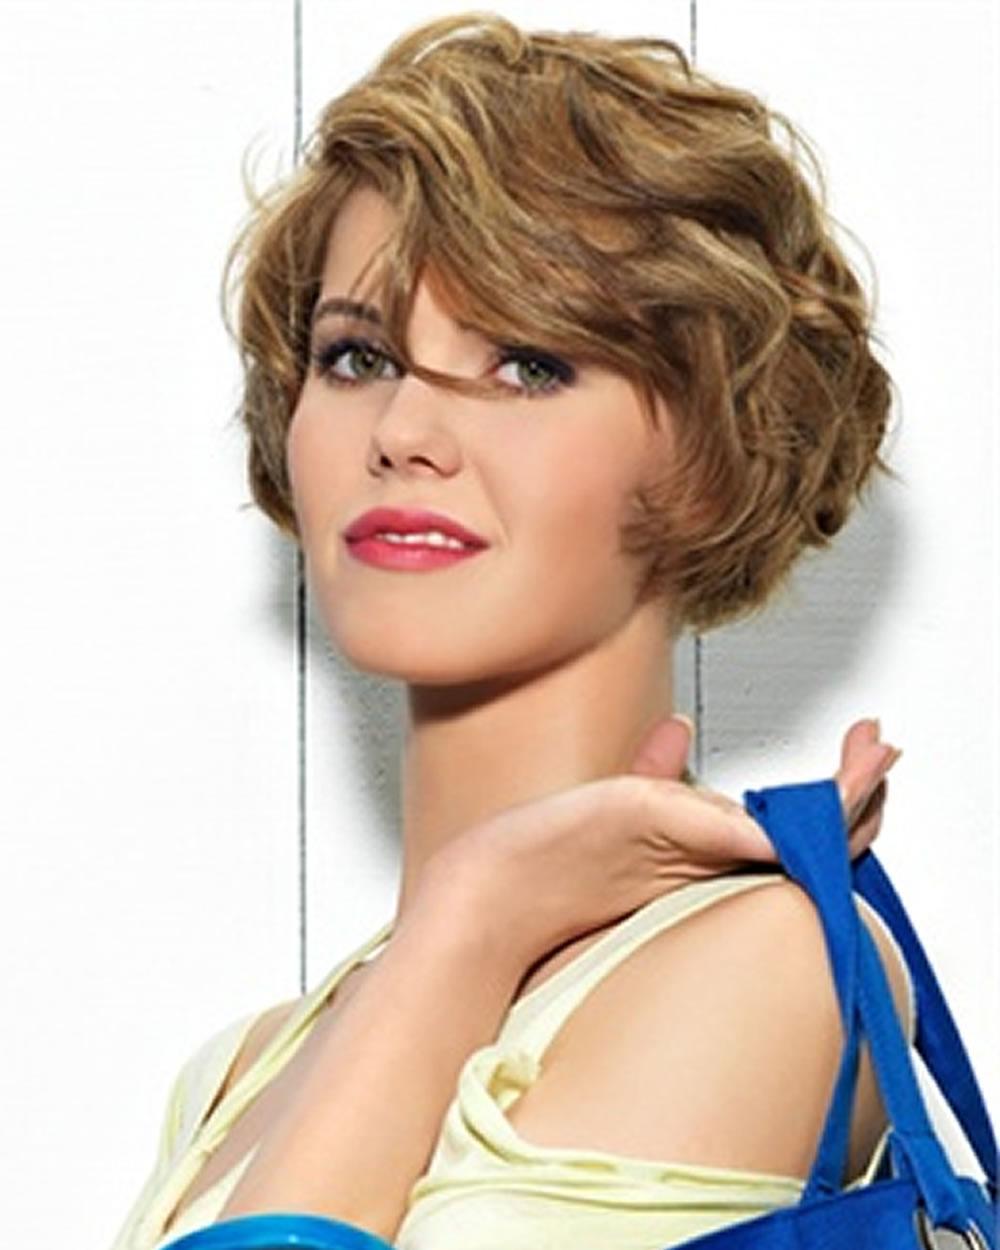 Short Hair Models 2018 – Newest Short Haircut Designs For 2018 Intended For Short Hair Cut Designs (View 24 of 25)